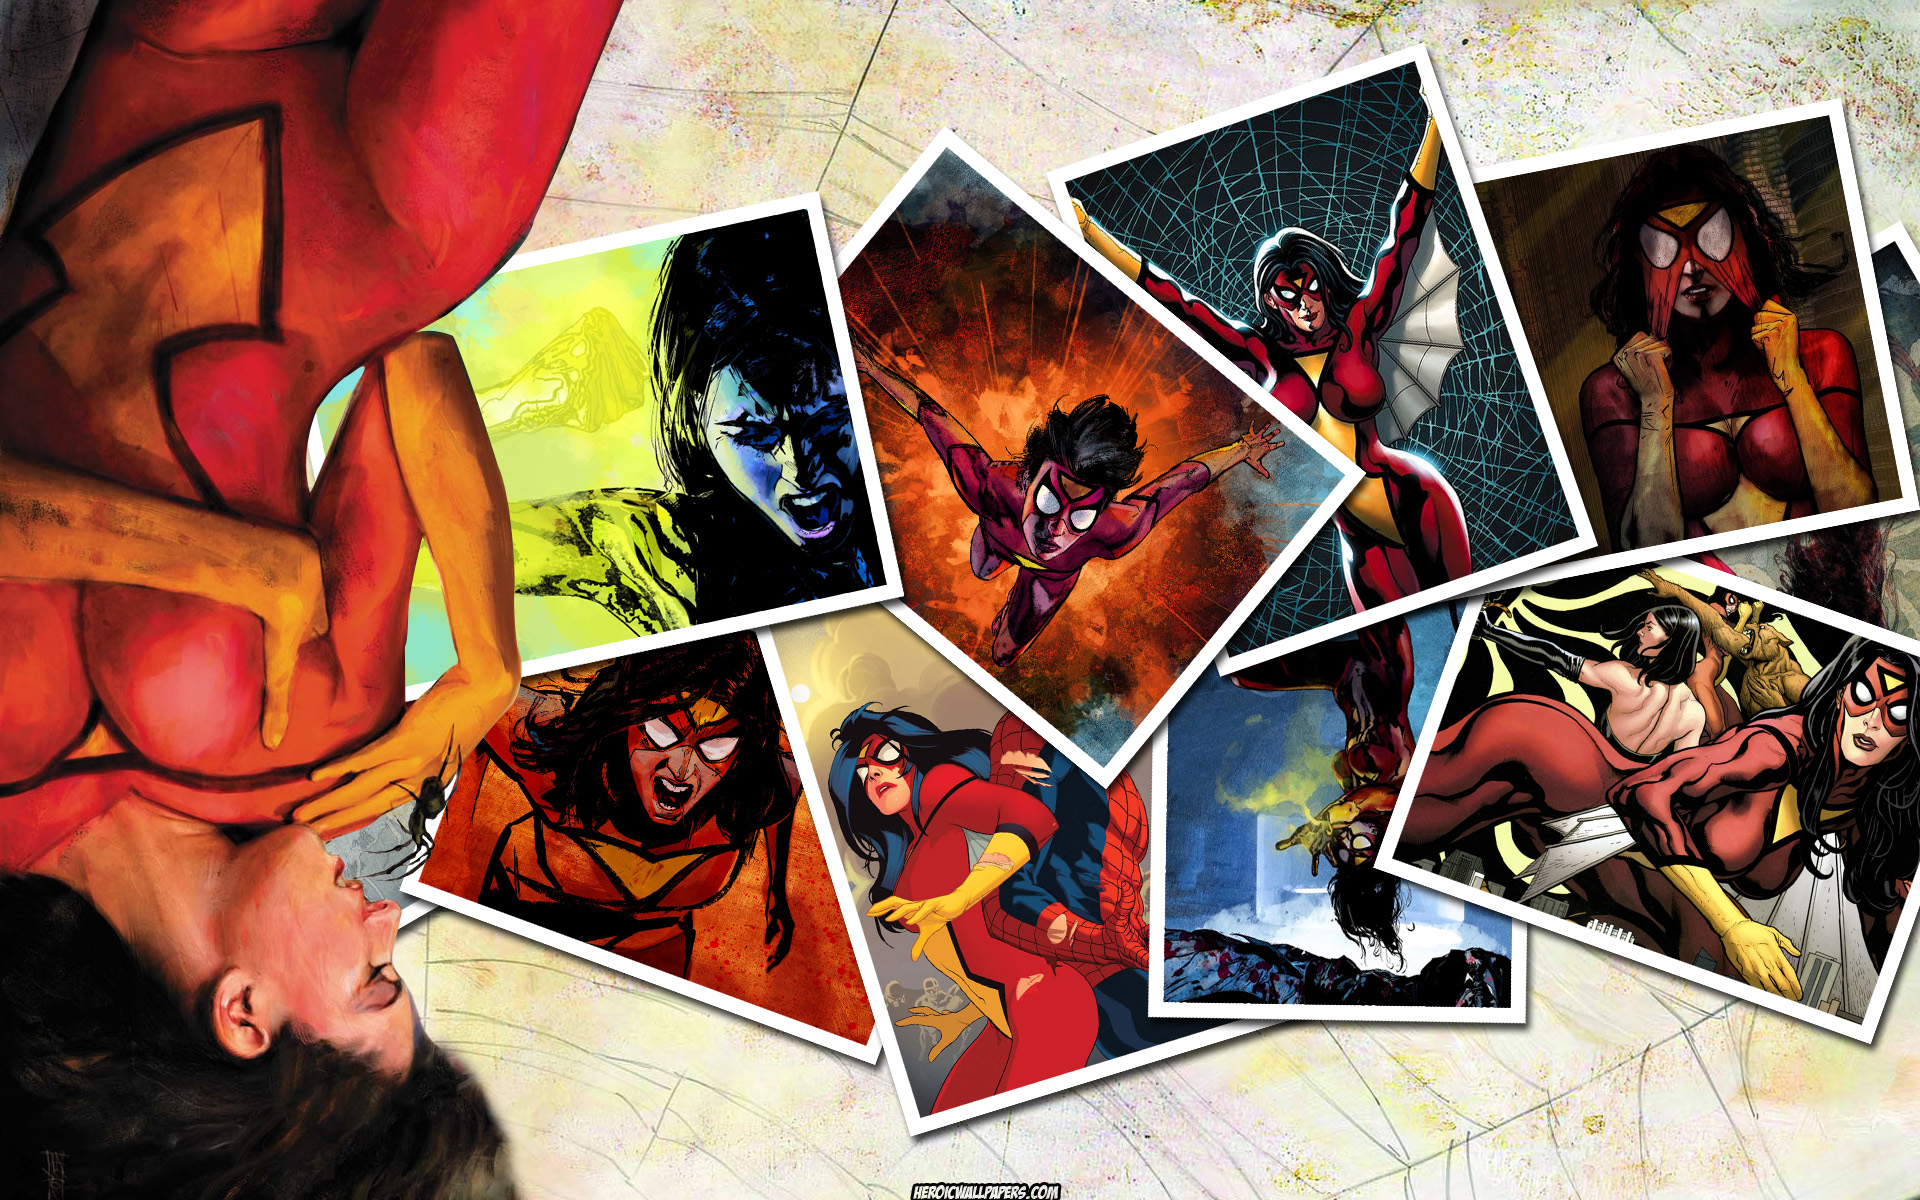 Srk 3d Wallpaper Spider Woman Computer Wallpapers Desktop Backgrounds